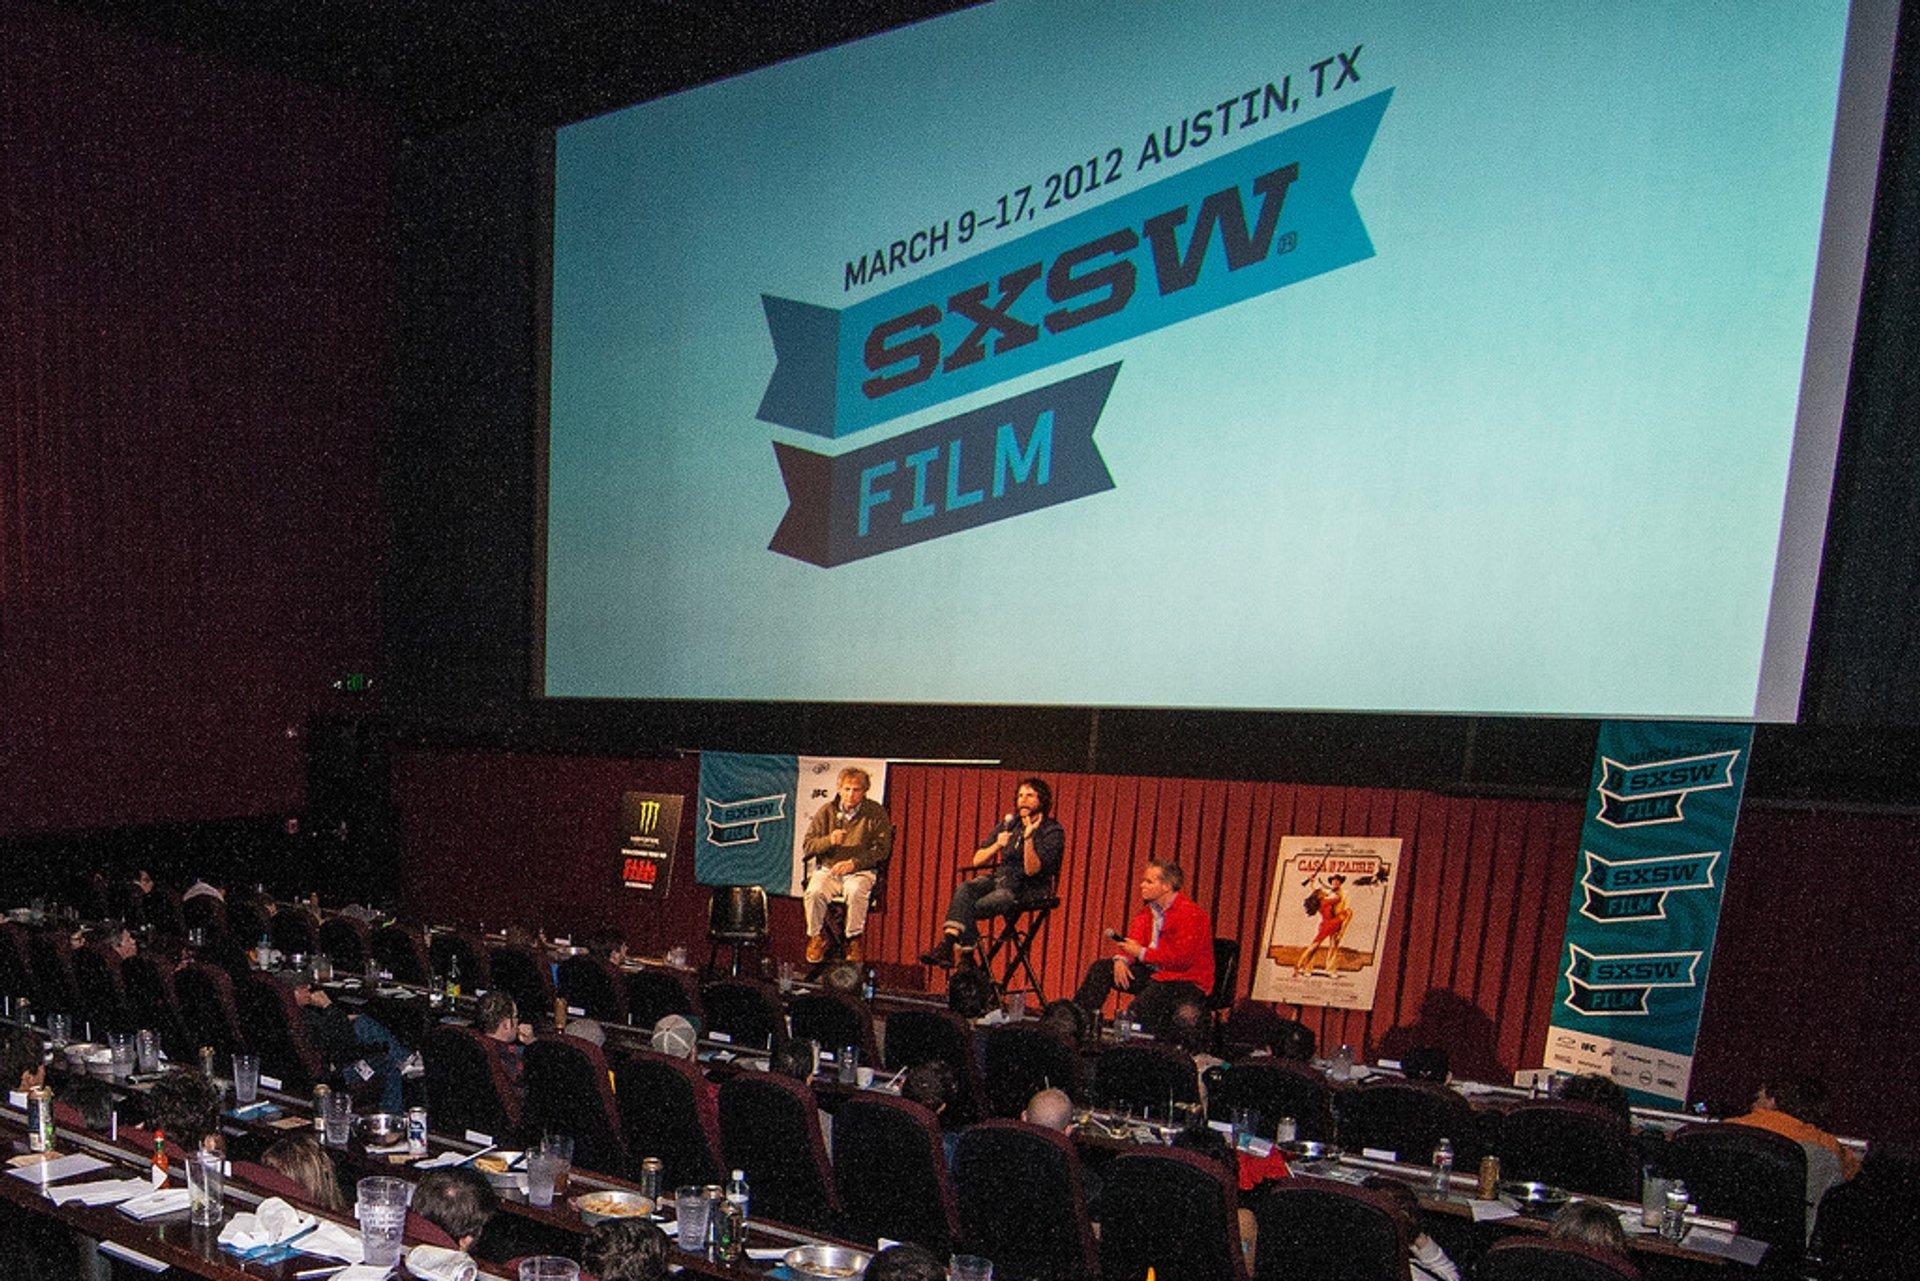 SXSW Film Festival in Texas 2020 - Best Time